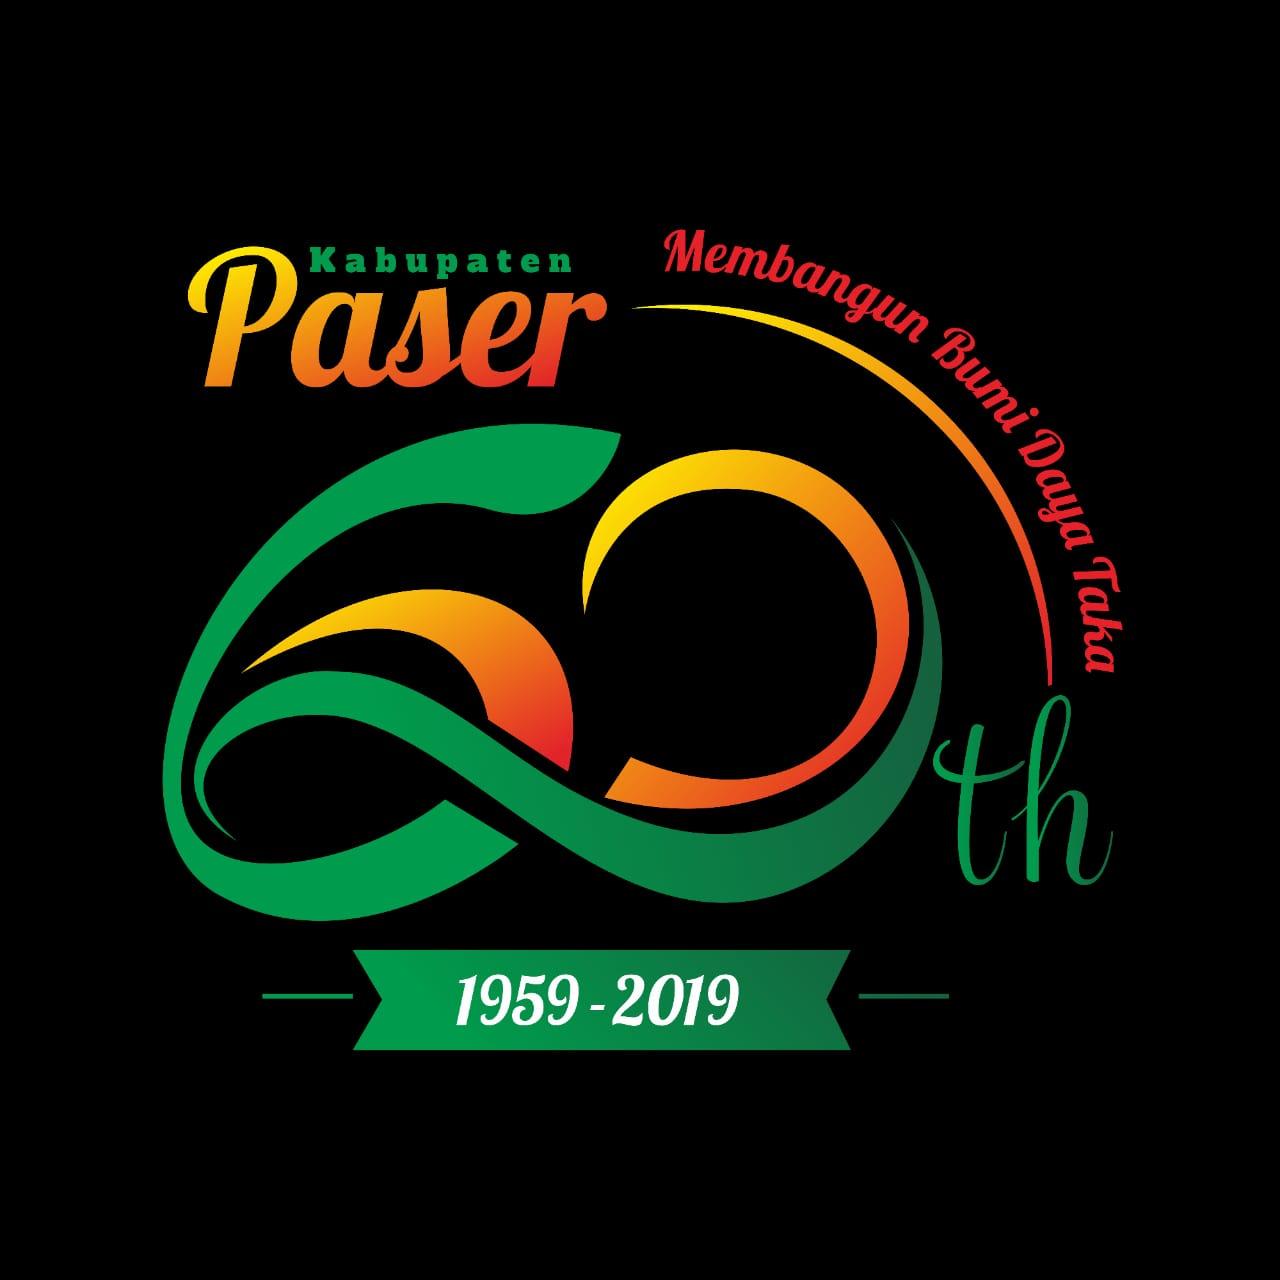 Pemkab Paser Sosialisasikan Logo Hari Jadi Kabupaten